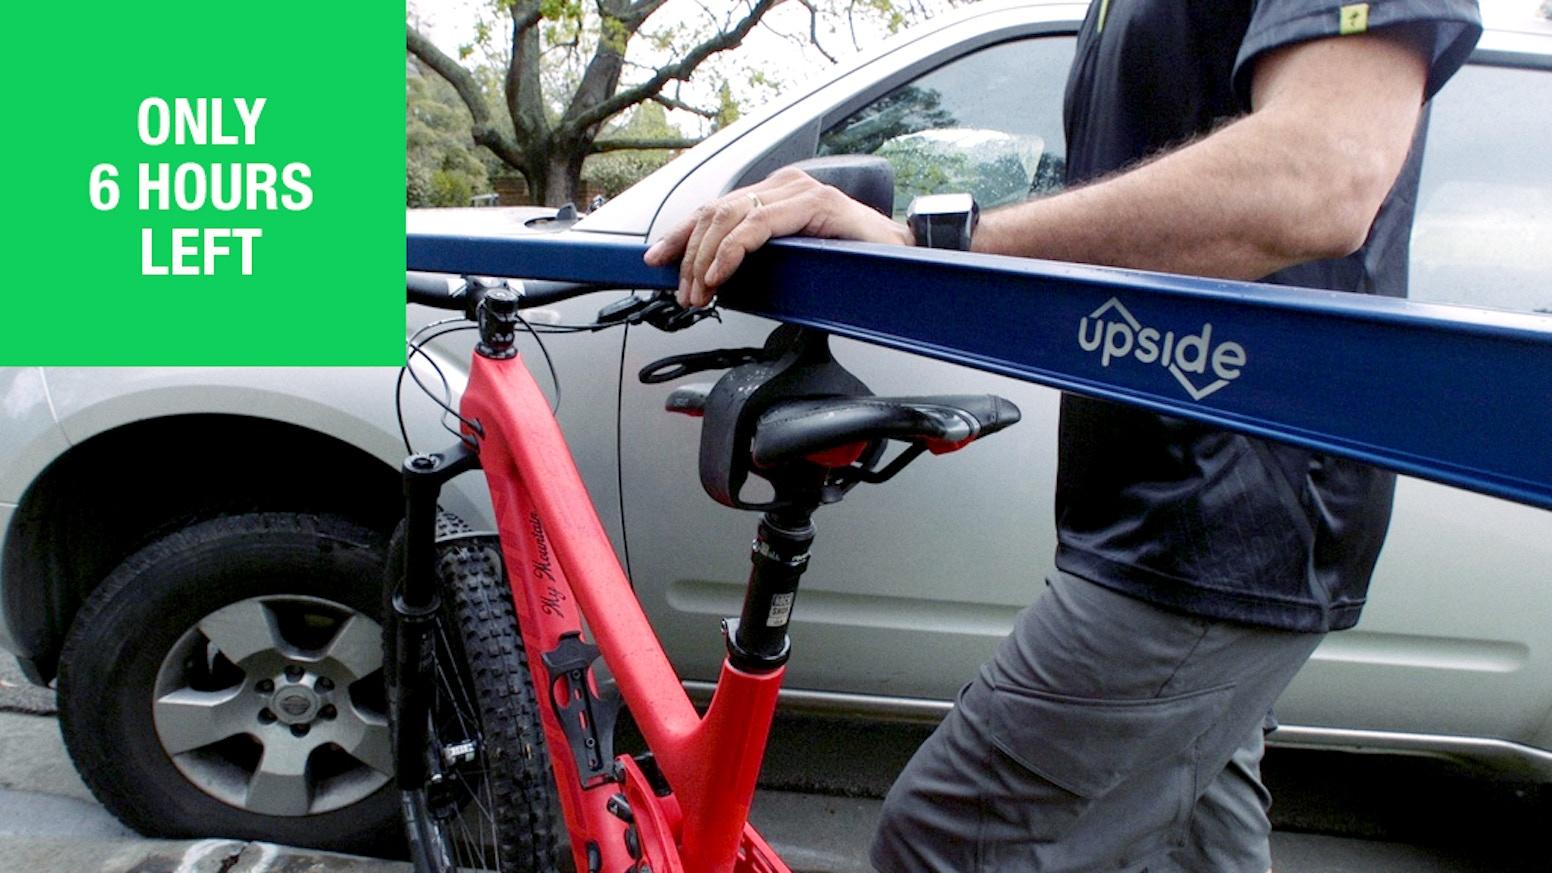 Upside Racks Want To Ride More Bikes Often By Bmw Fat Bike Kickstarter